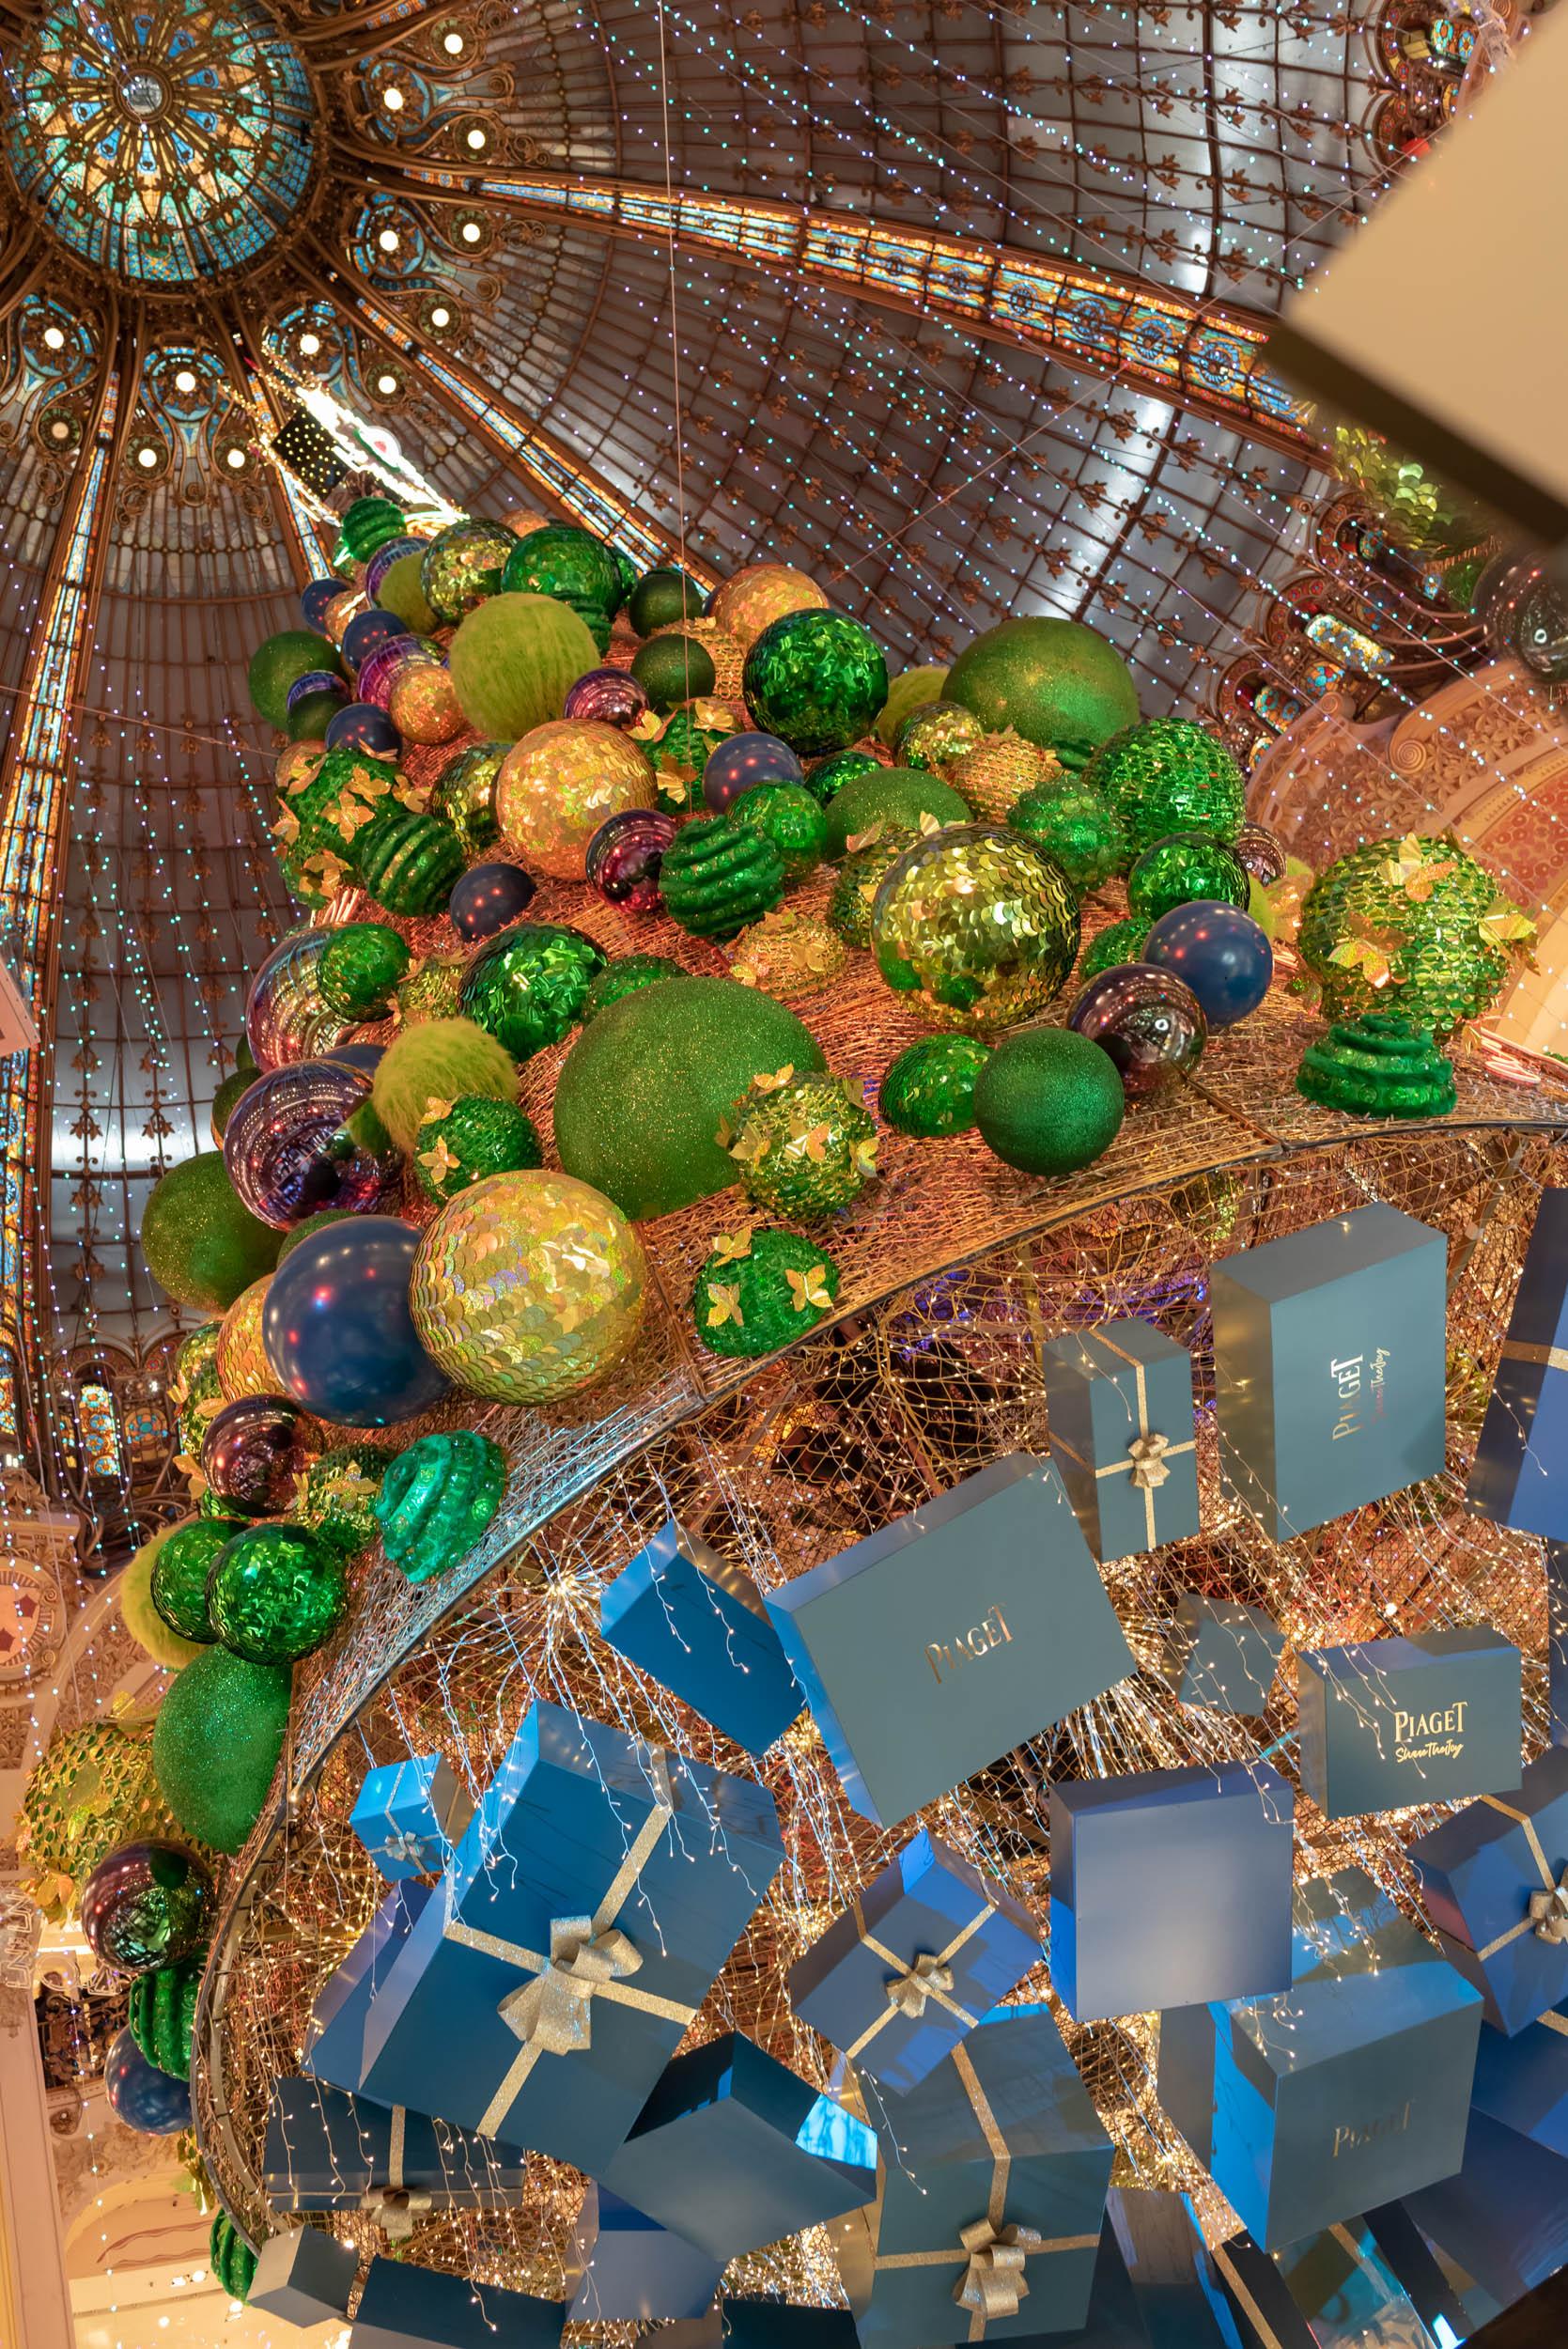 Sapin de Noël 2018 - Galeries Lafayette